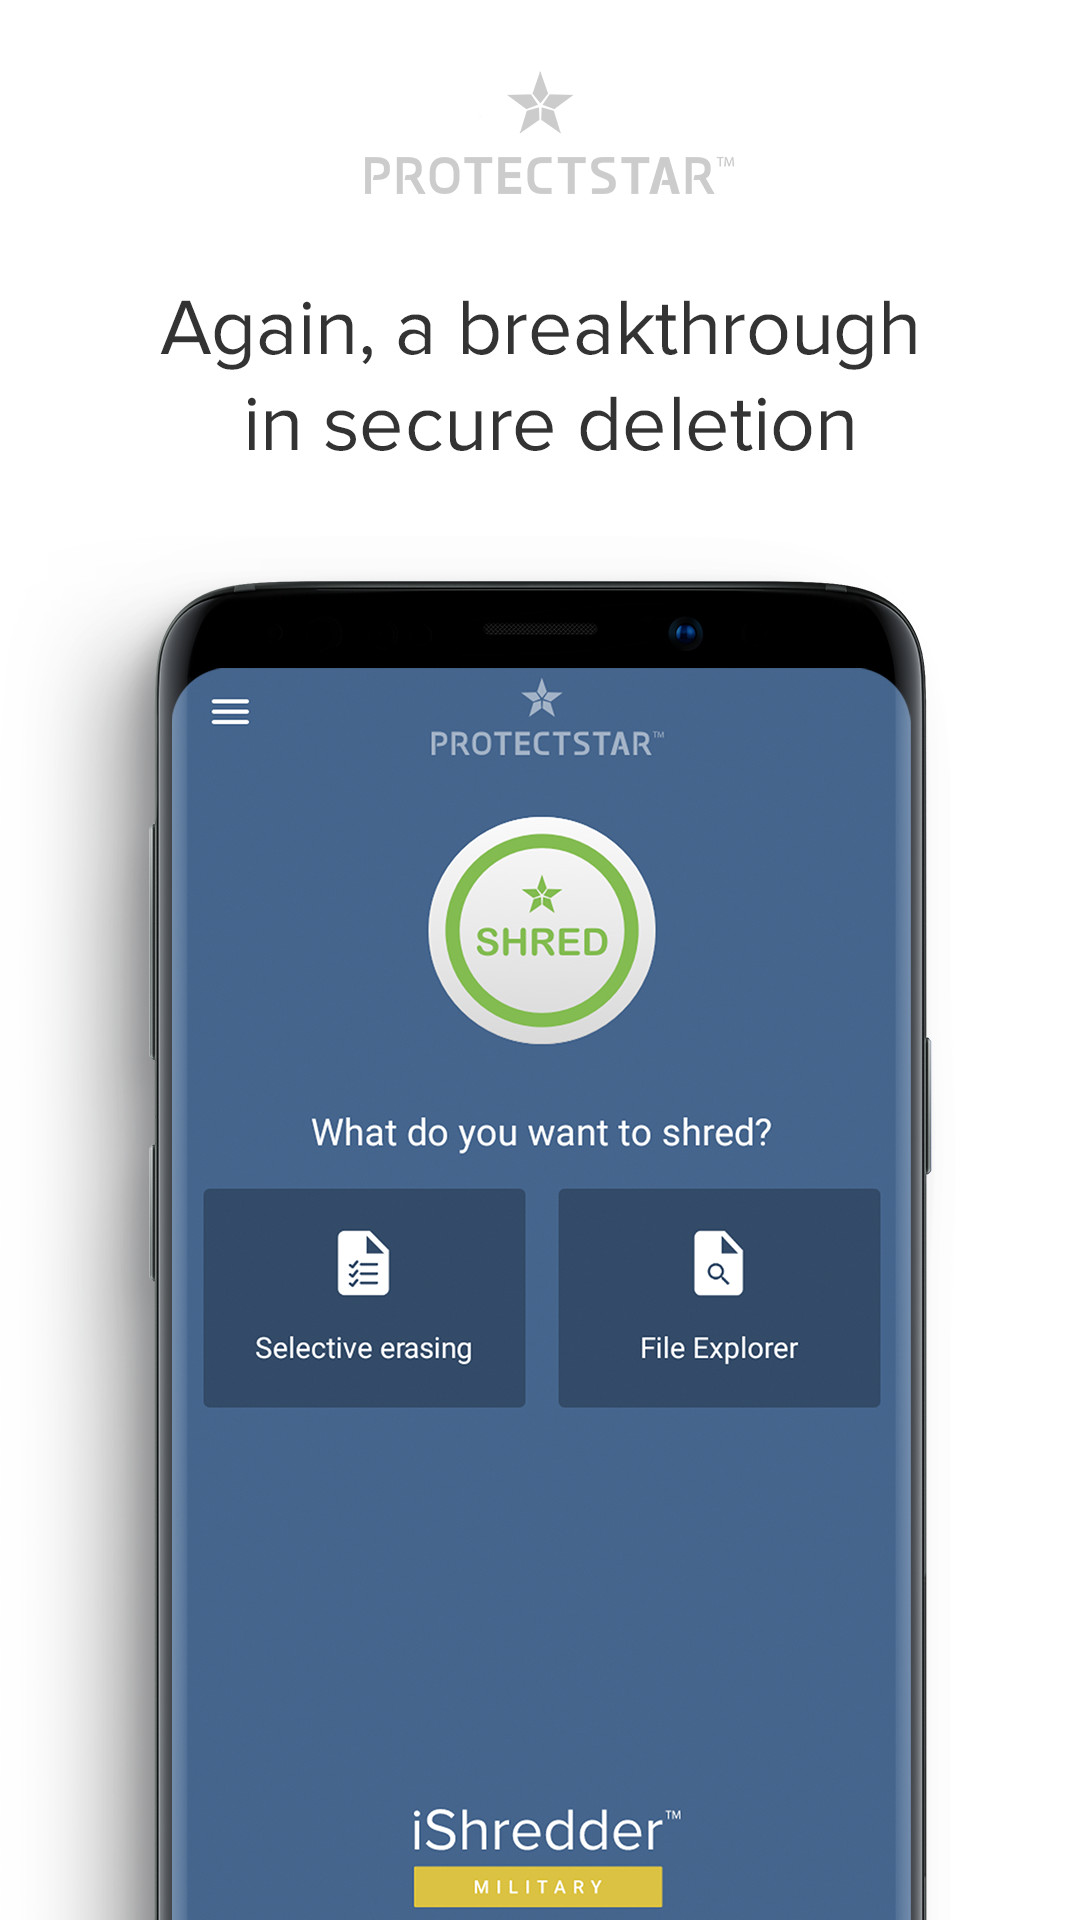 iShredder Android 6 - screenshot